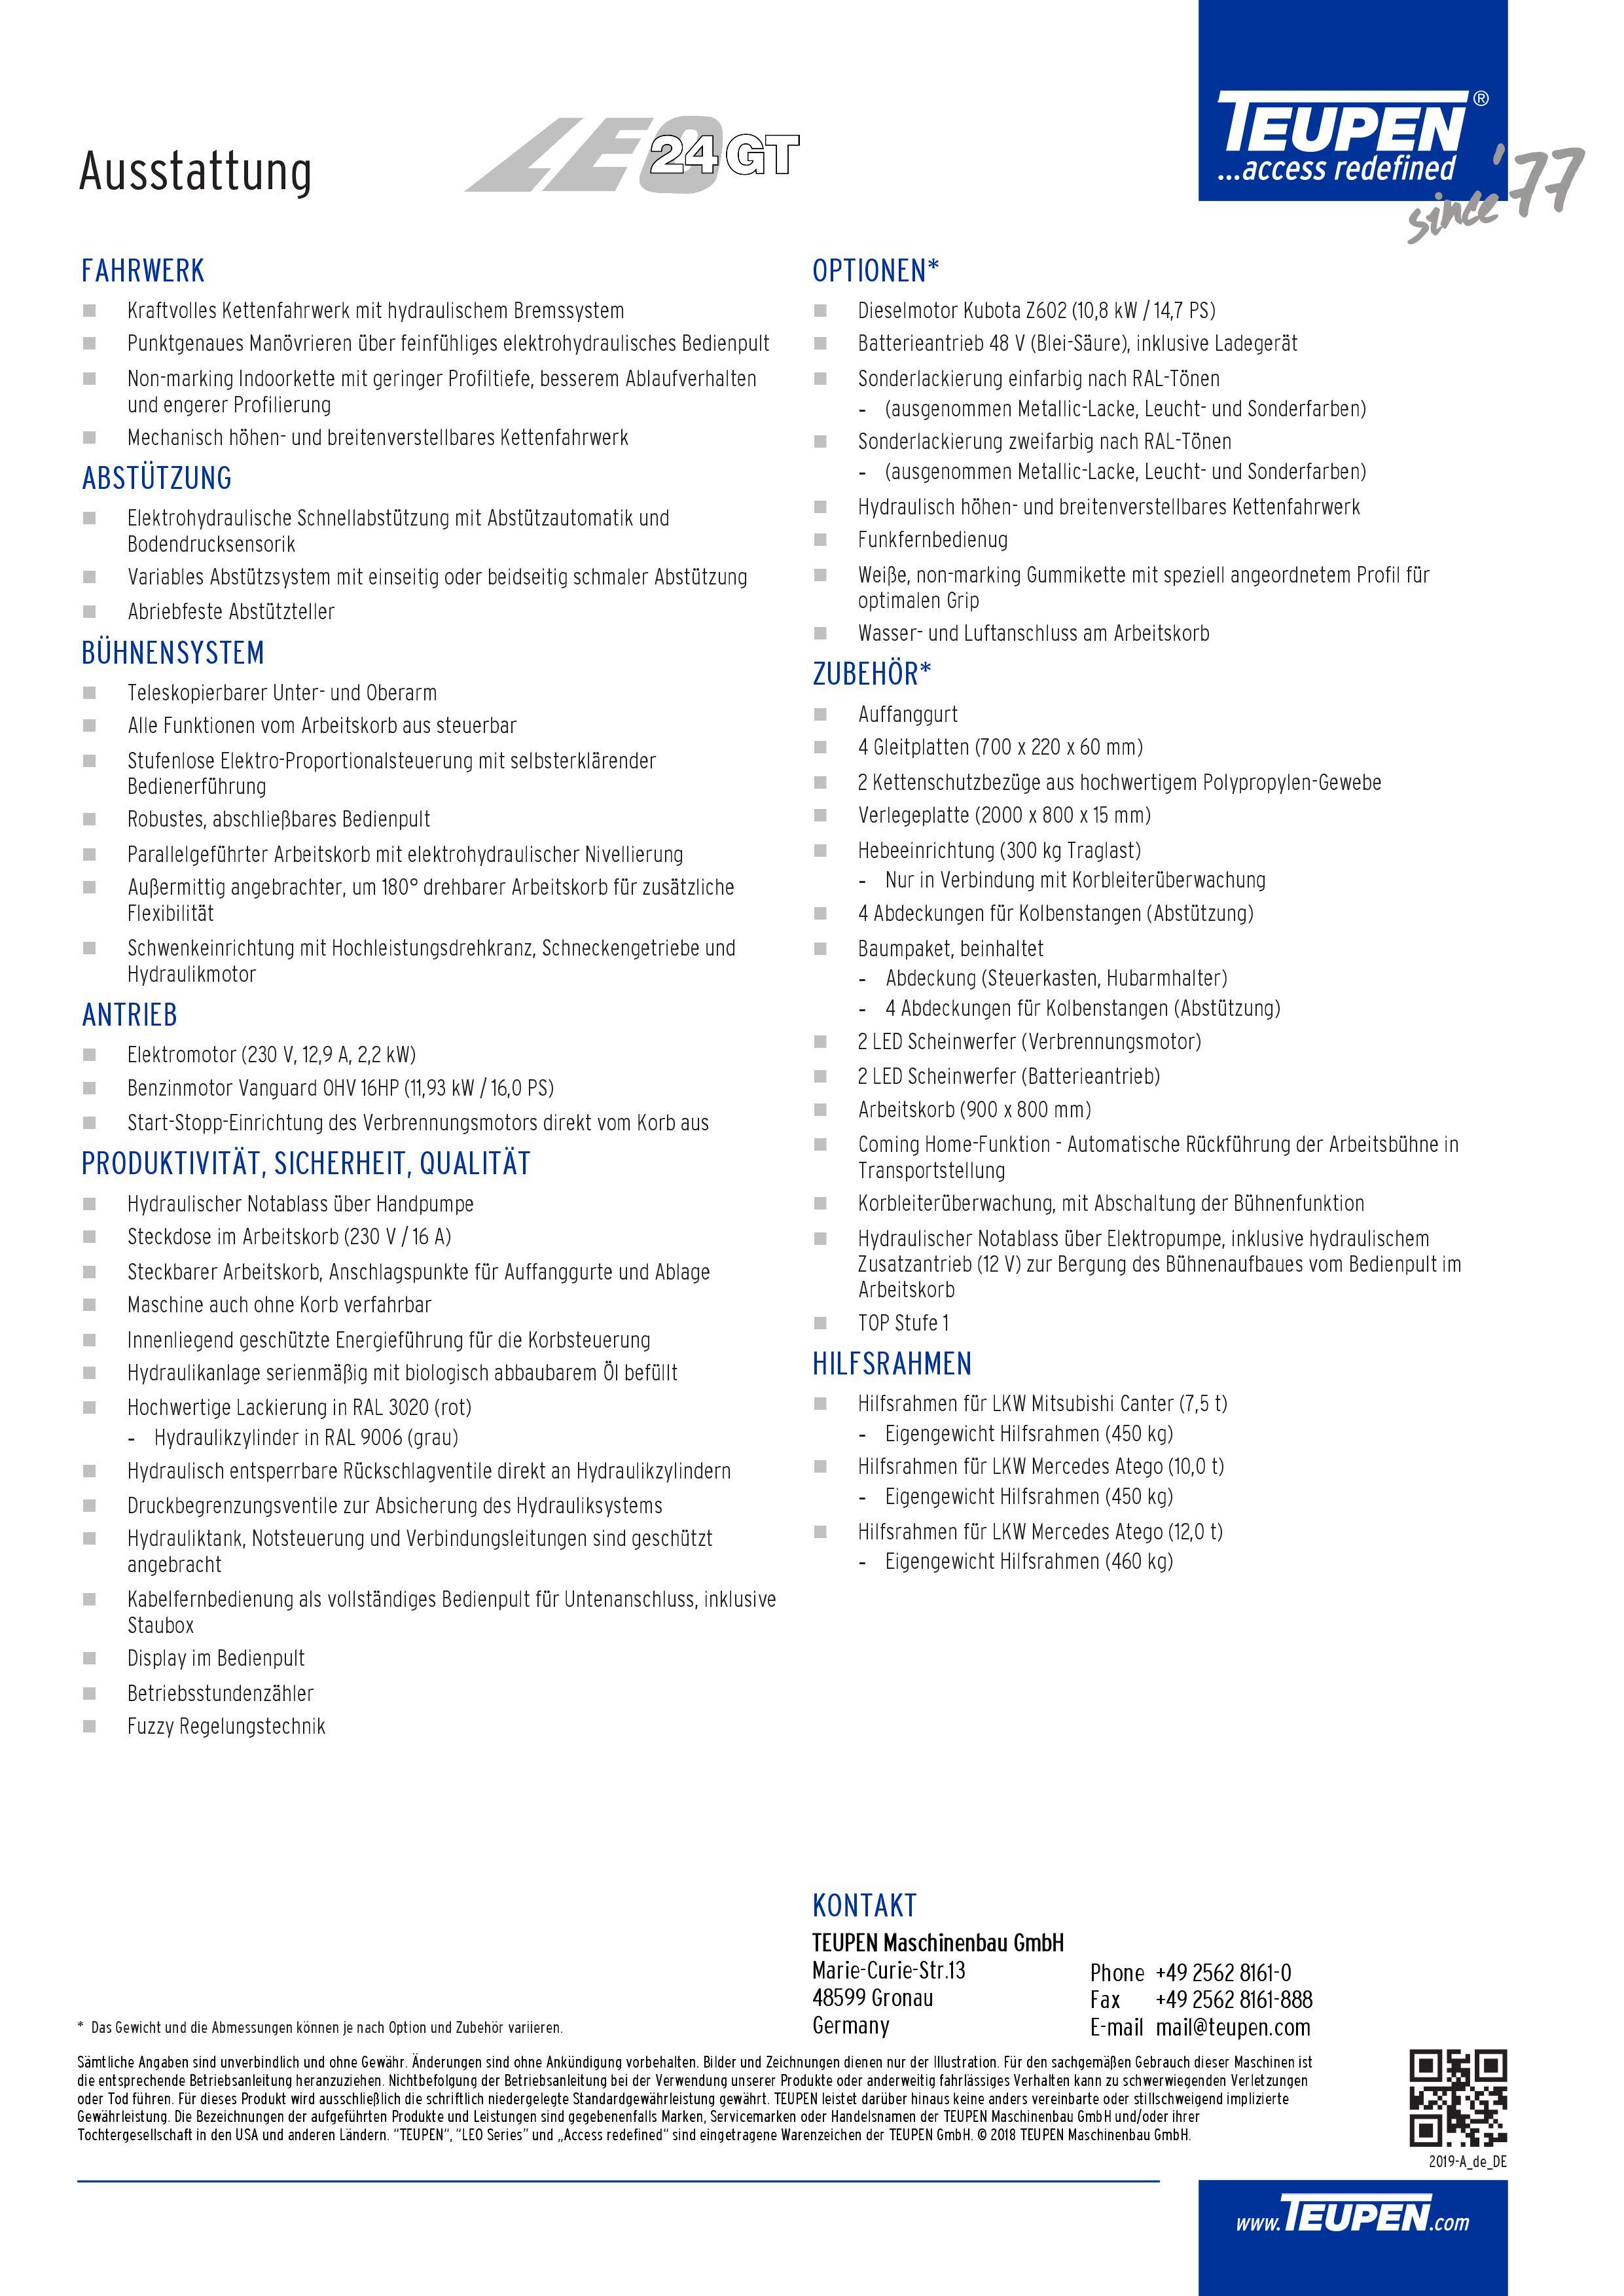 LEO24GT Datenblatt 2